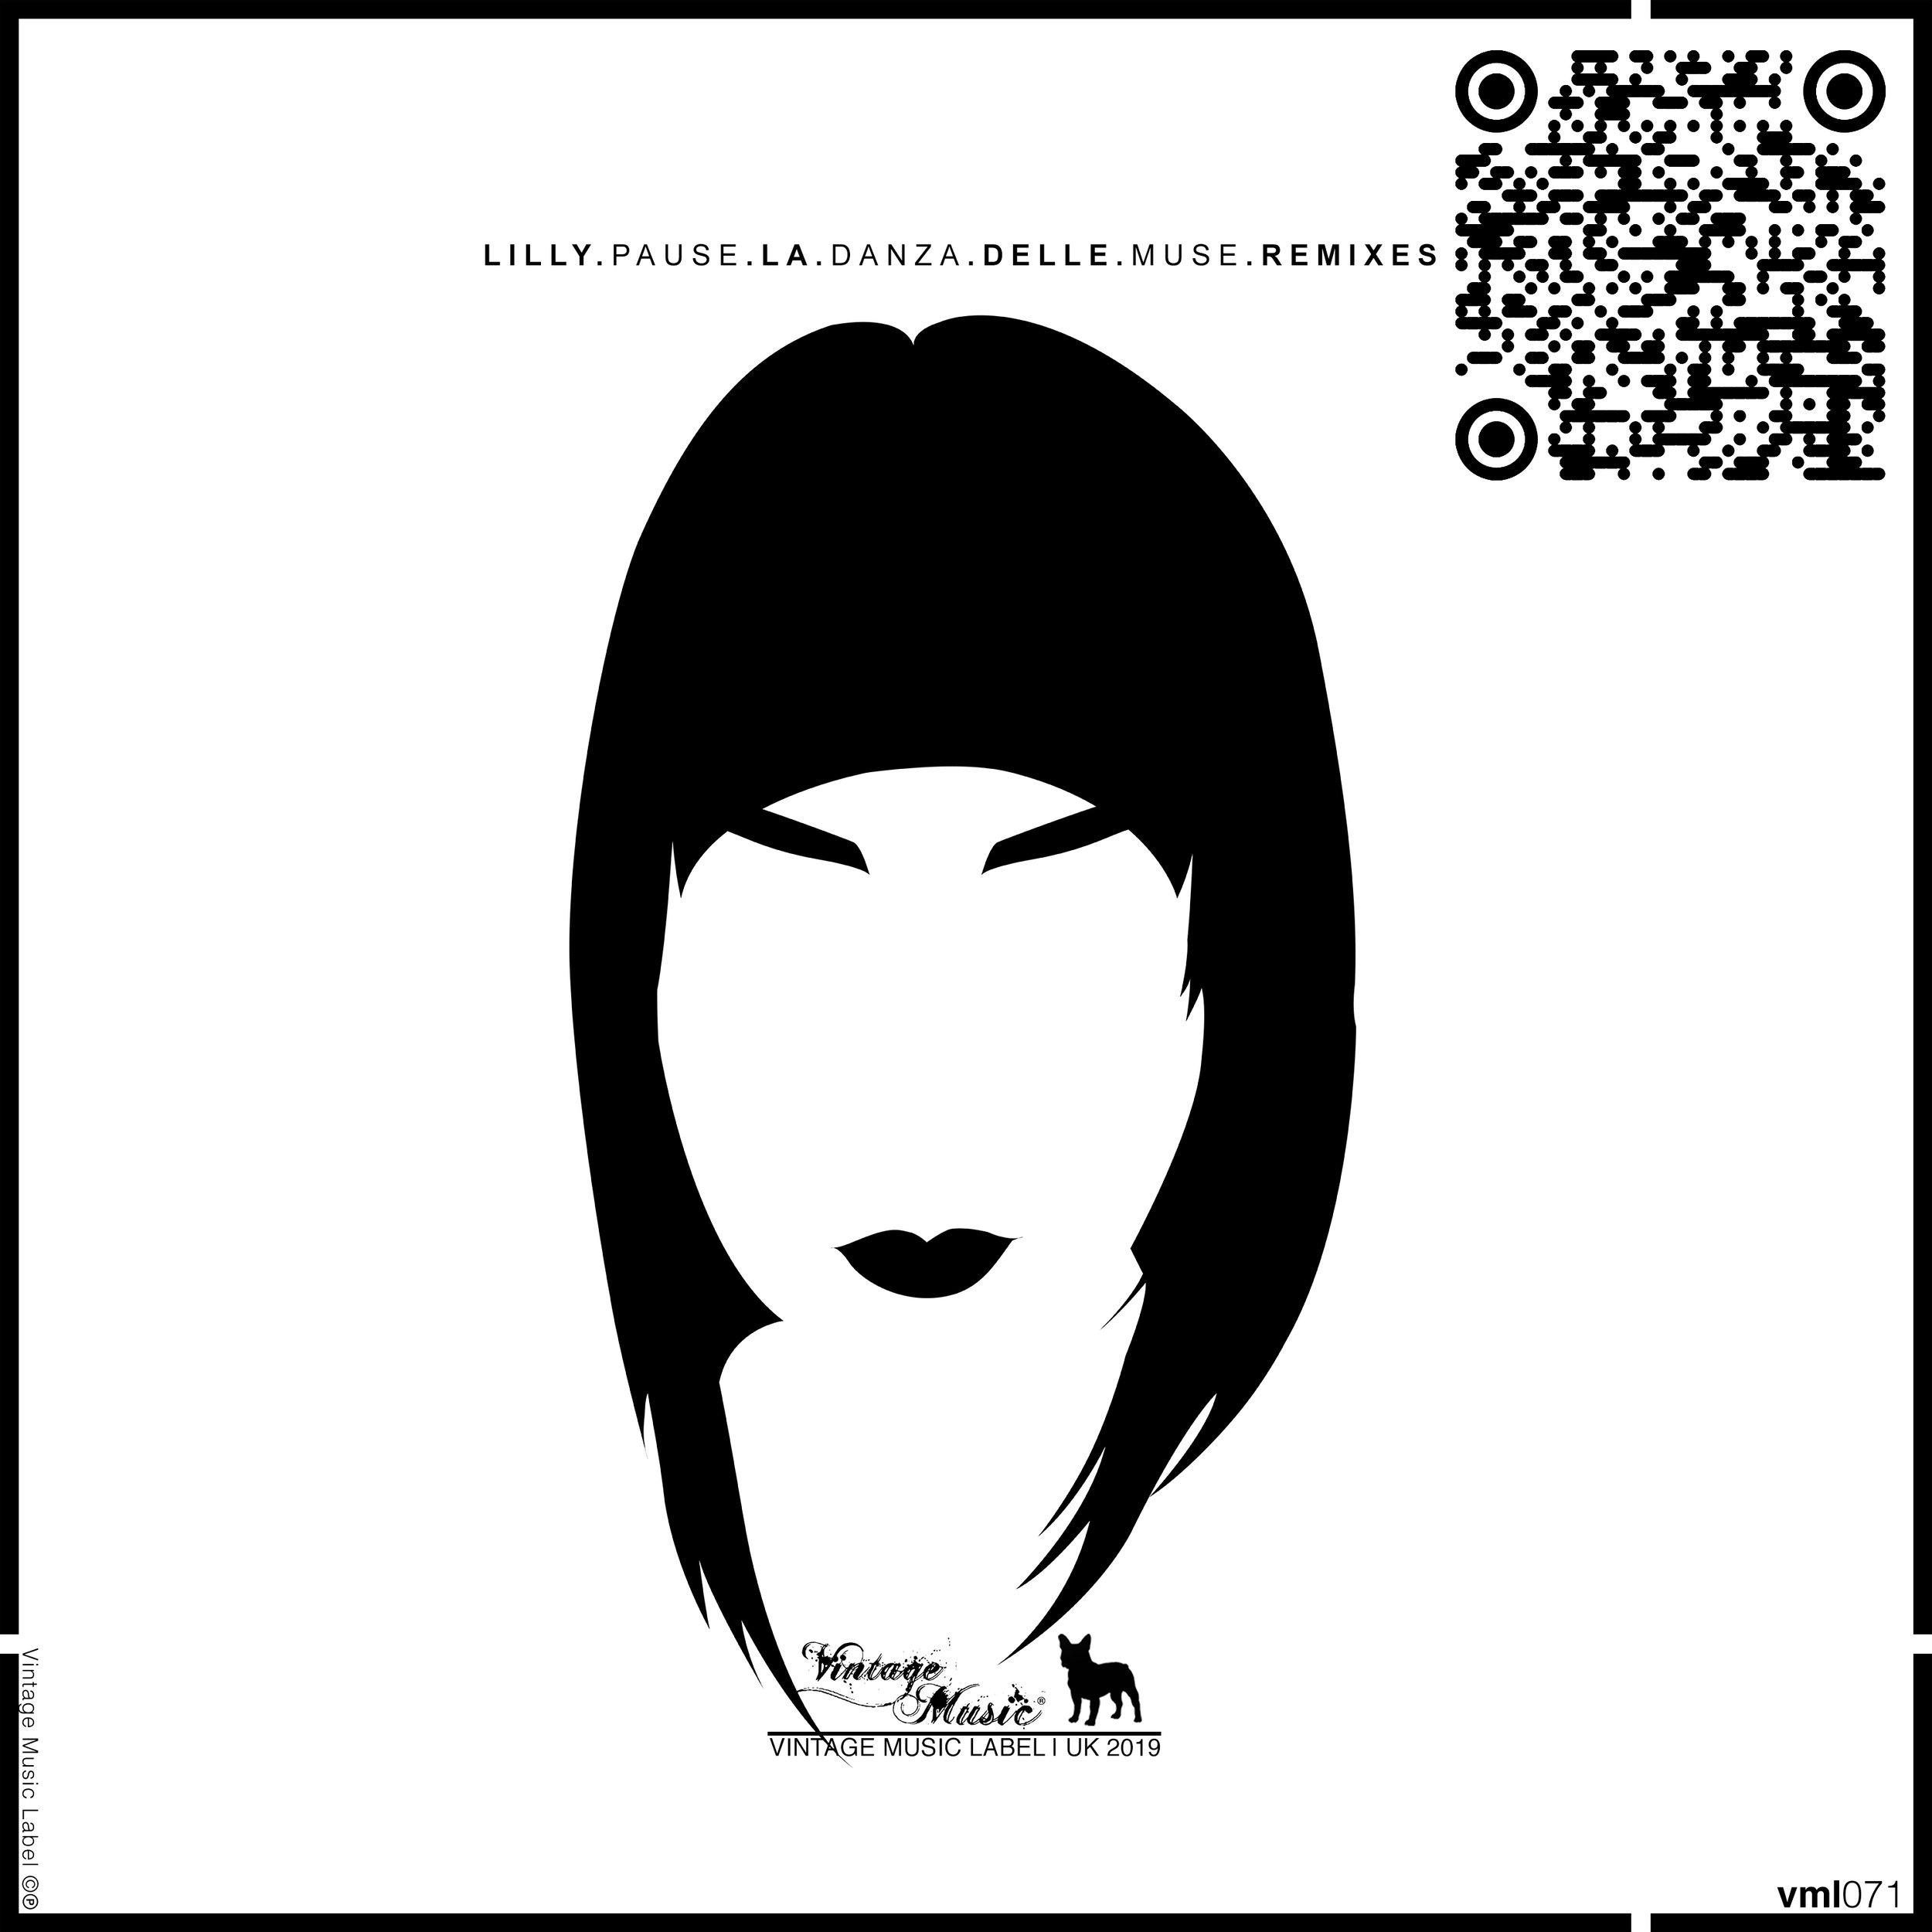 https://www.beatport.com/release/la-danza-delle-muse-remixes/2518149